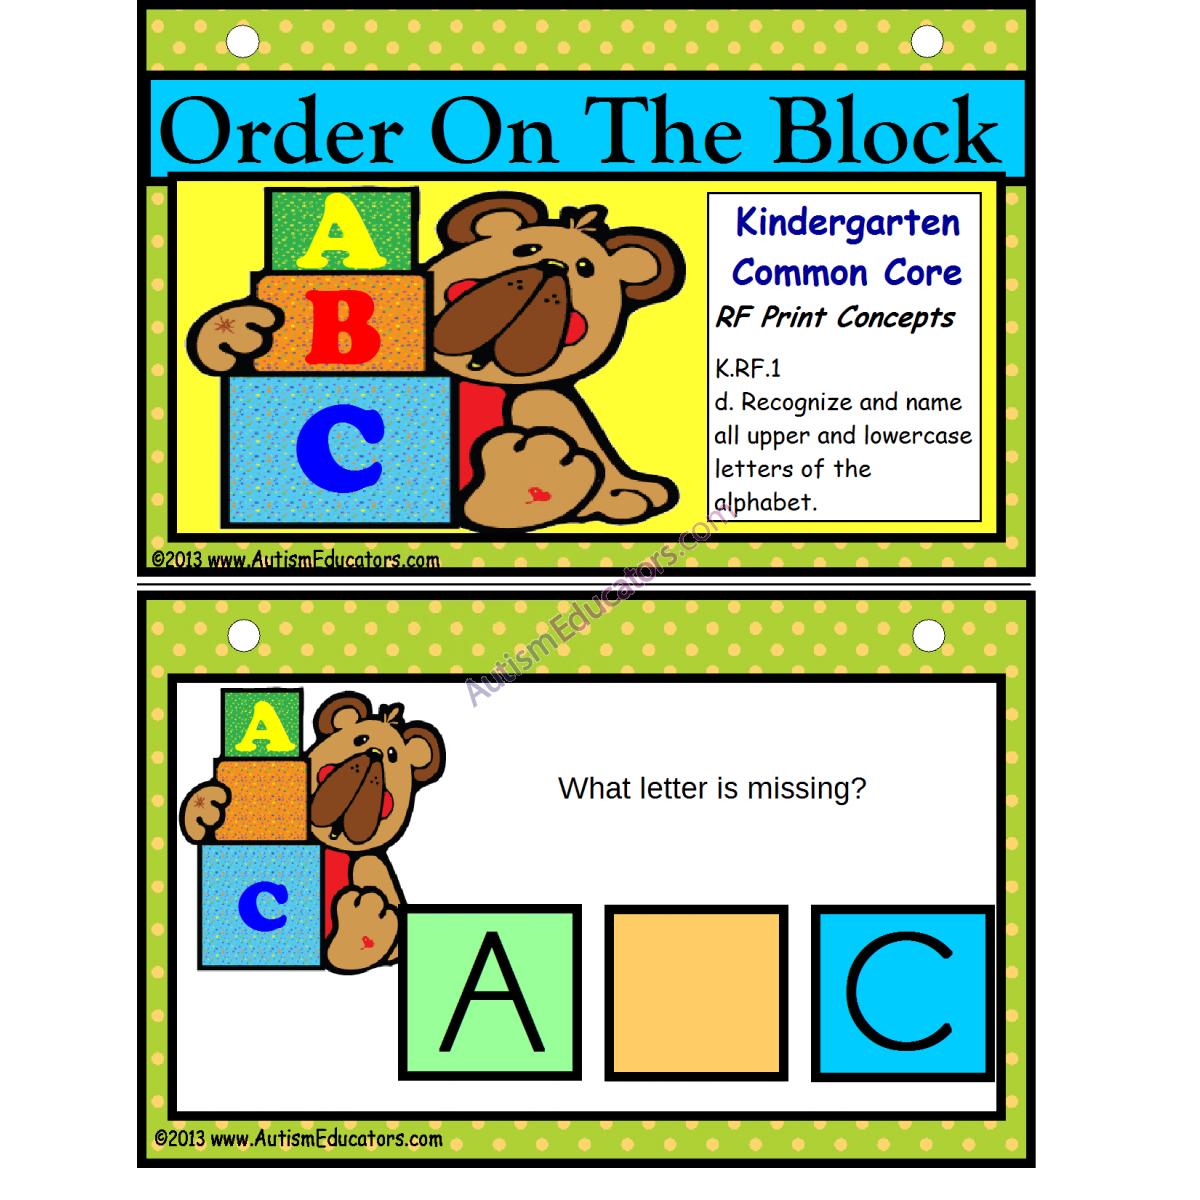 Alphabetical Order Kindergarten Common Core Activity For